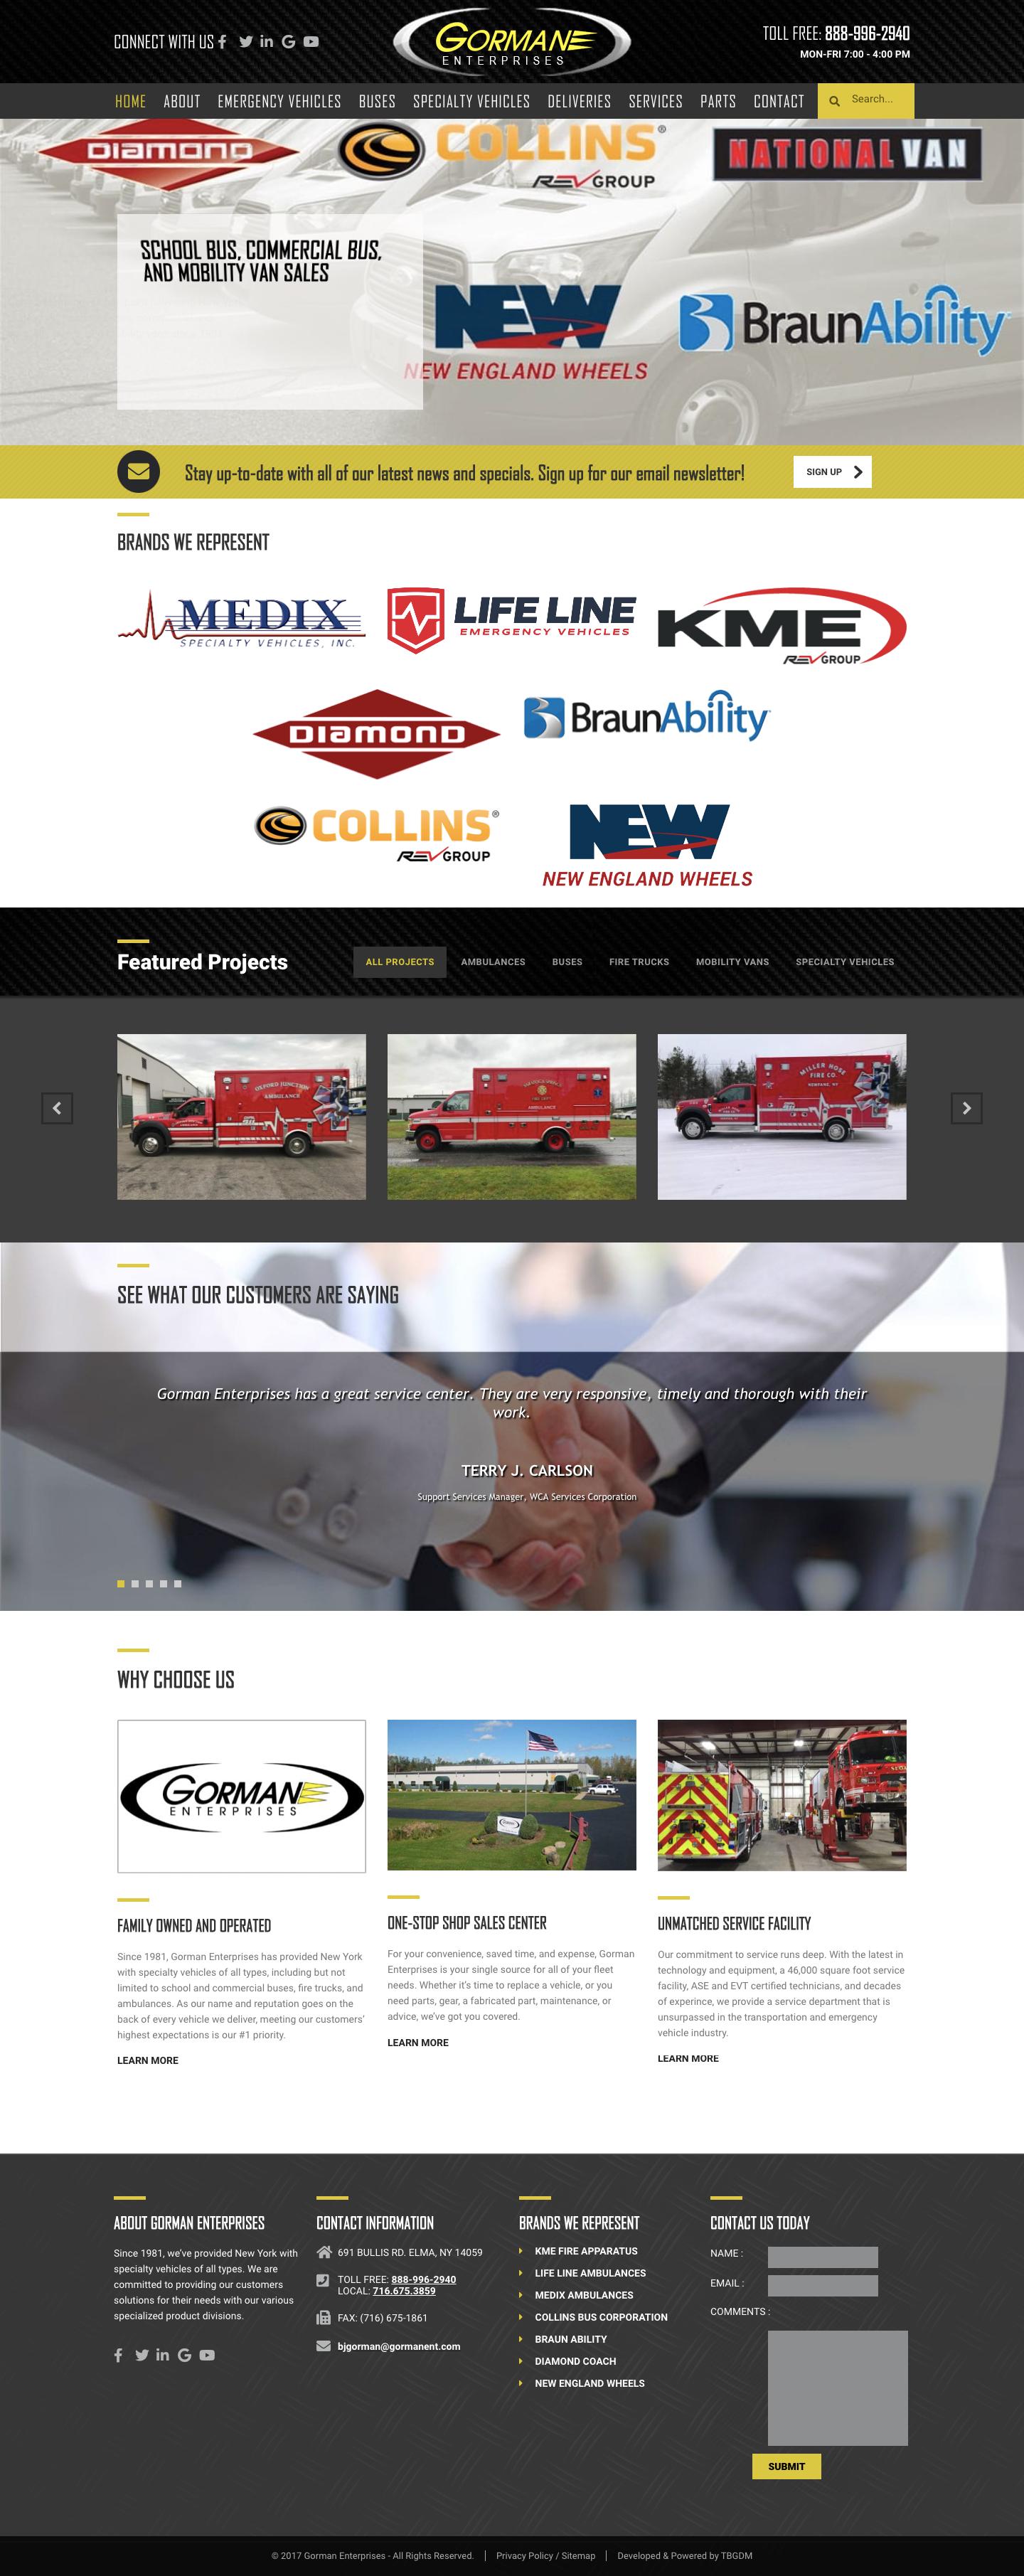 Gorman Enterprises Website